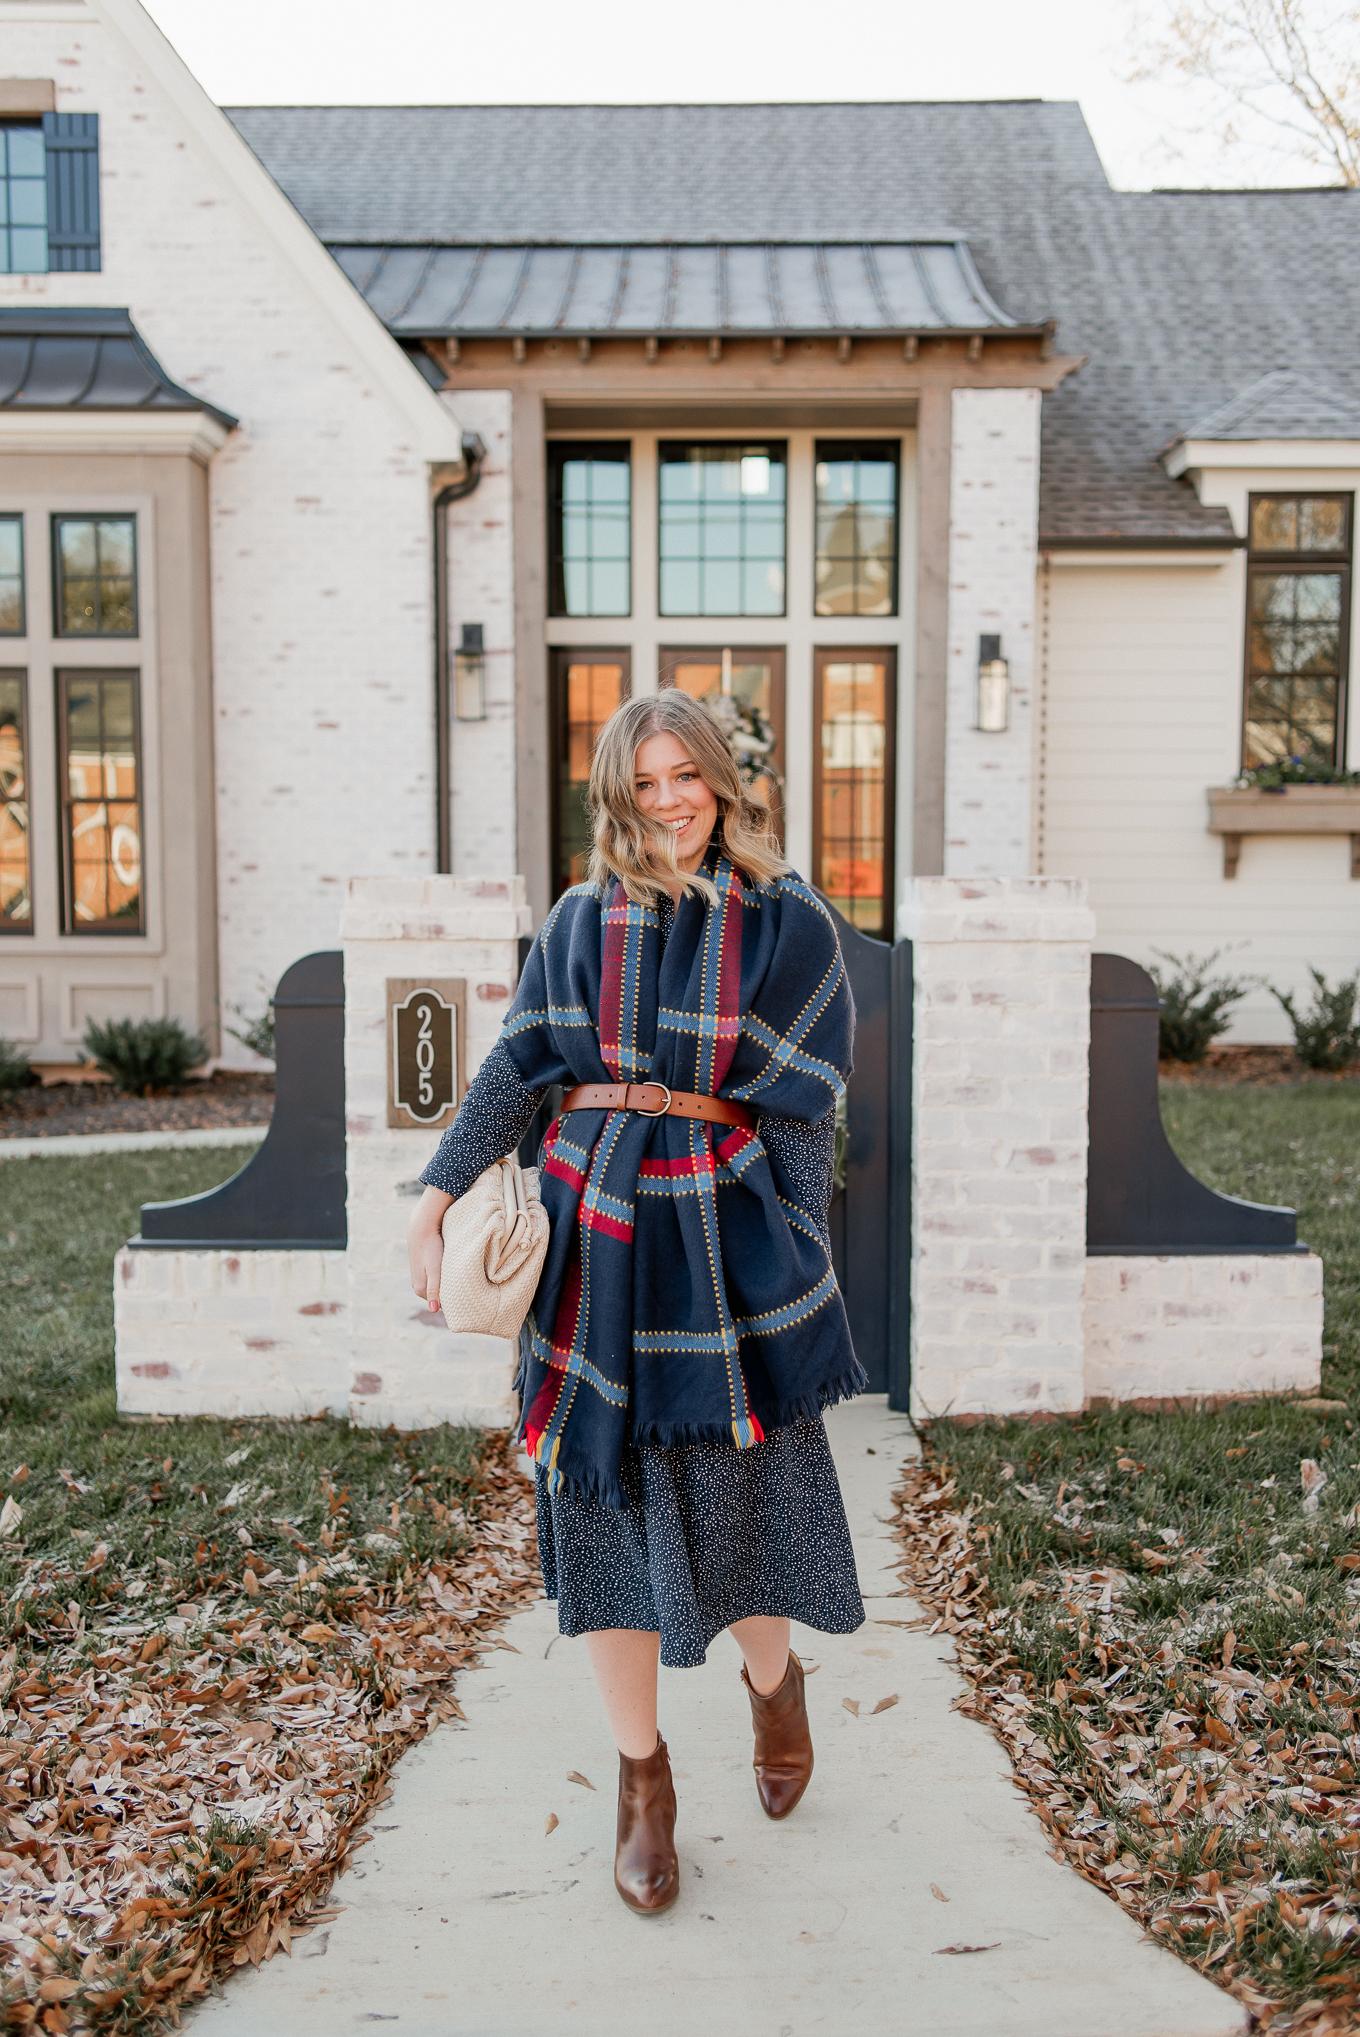 Winter Dresses | Navy Shirtdress, Midi Dress, Navy Blanket Scarf, BOTTEGA VENETA dupe #dupes #winterdresses #winterstyle